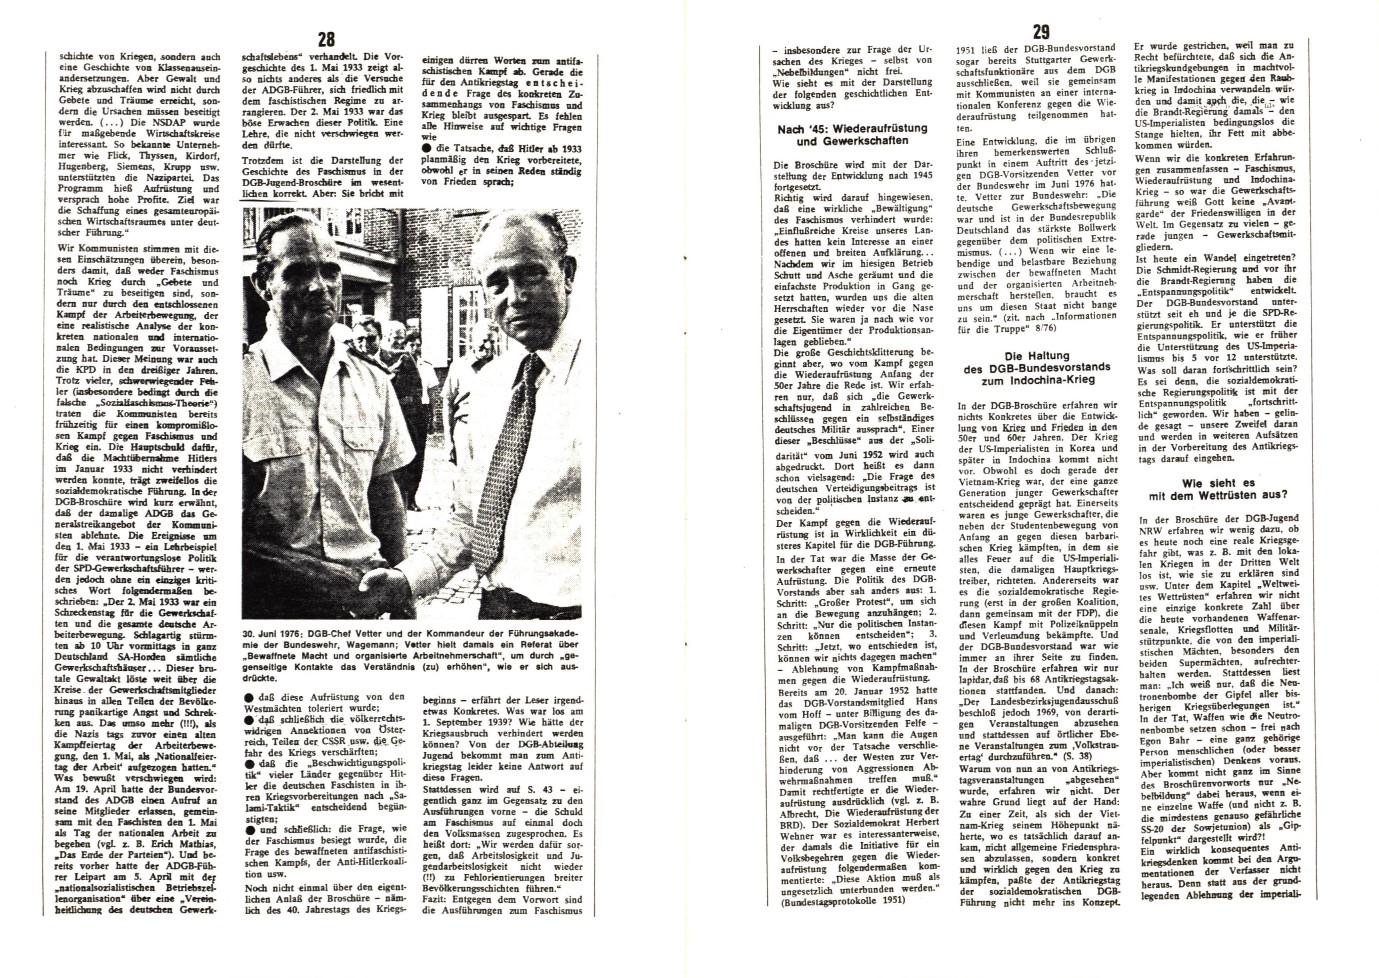 KJVD_1979_Dokumente_zum_Antikriegstag_18